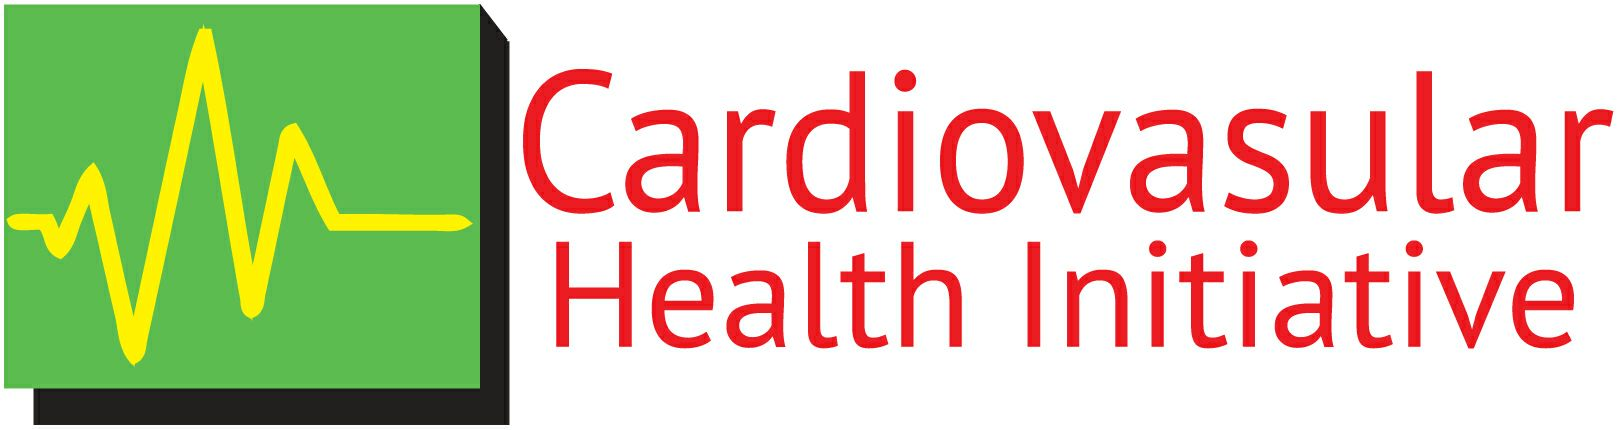 Cardiovascular Health Initiative